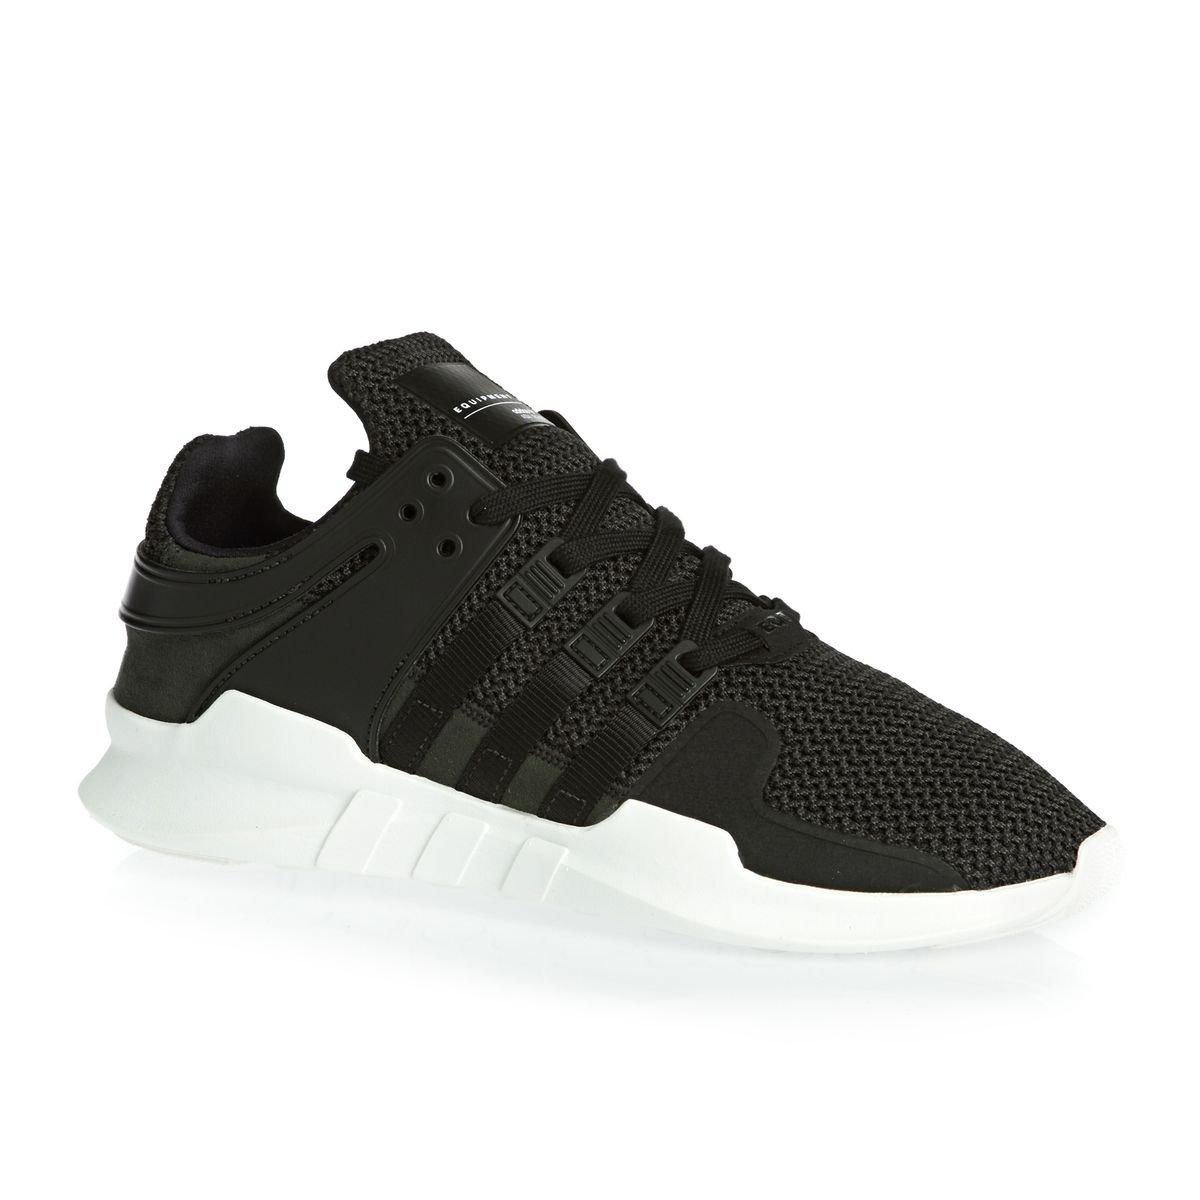 Adidas EQT Support ADV, Zapatillas para Hombre 39 1/3 EU|black/power blue